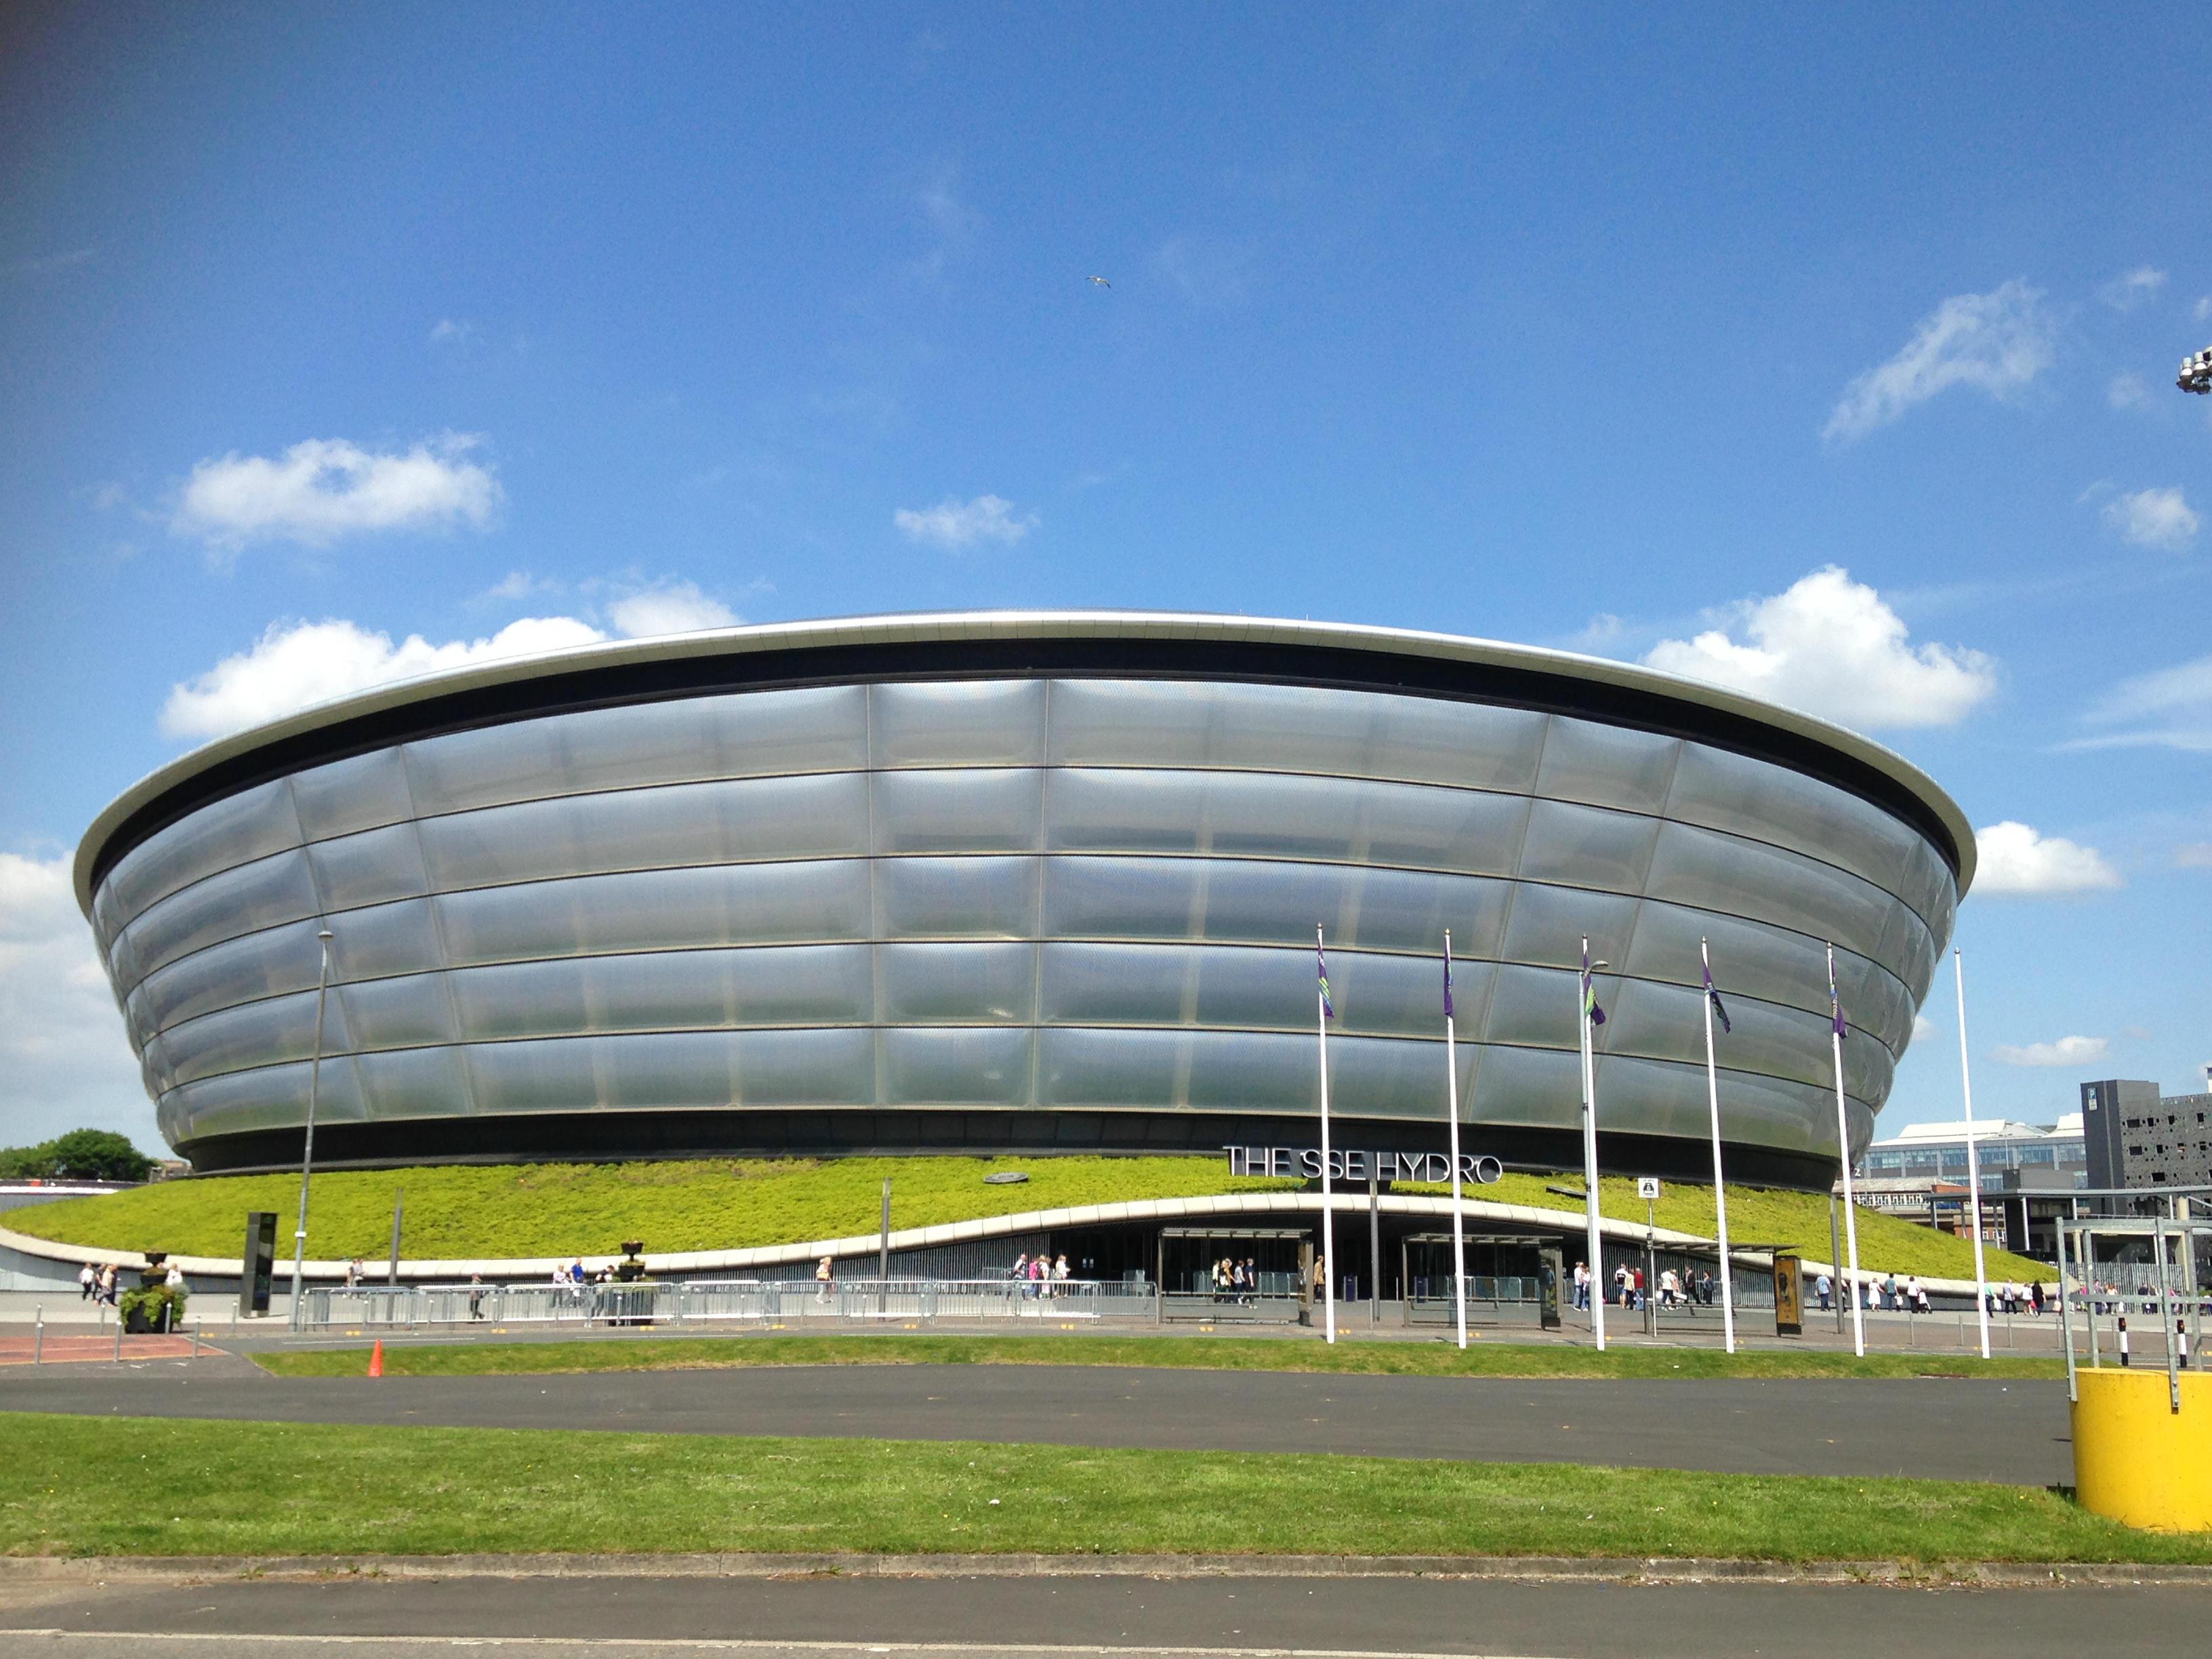 SSE Hydro Glasgow